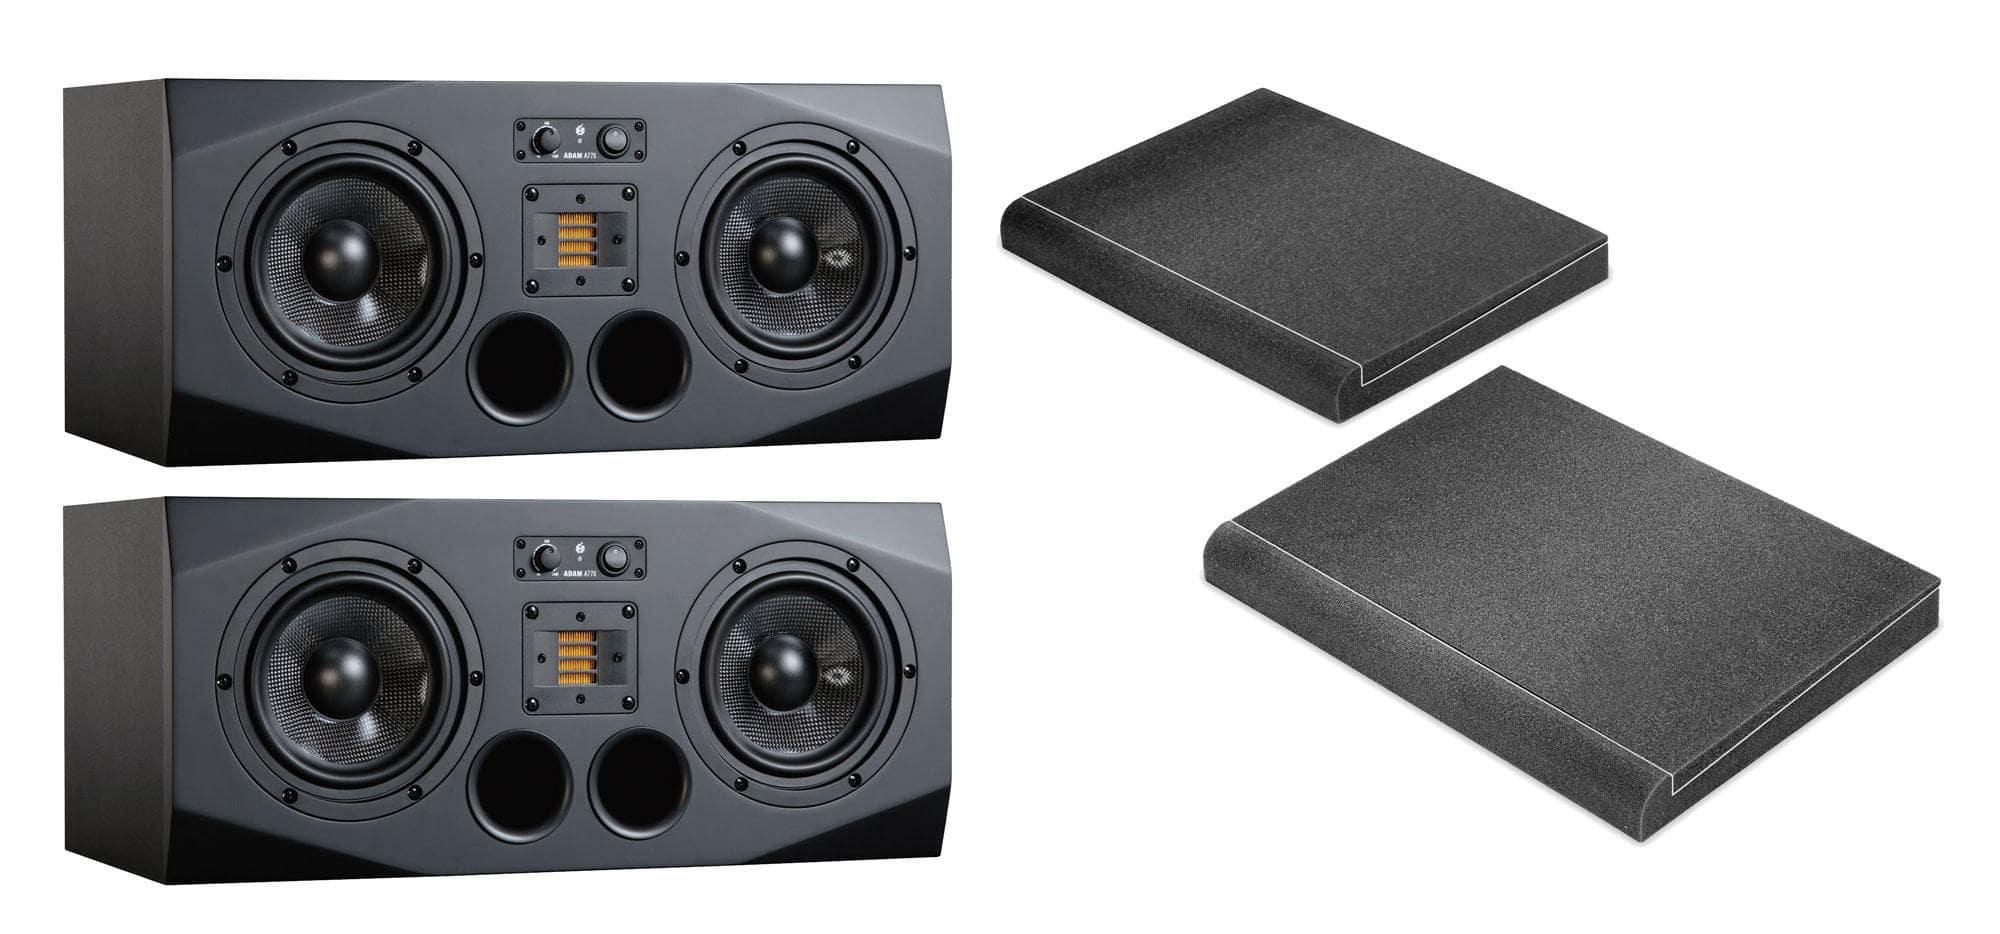 Studiomonitore - Adam Audio A77X ISO Bundle - Onlineshop Musikhaus Kirstein